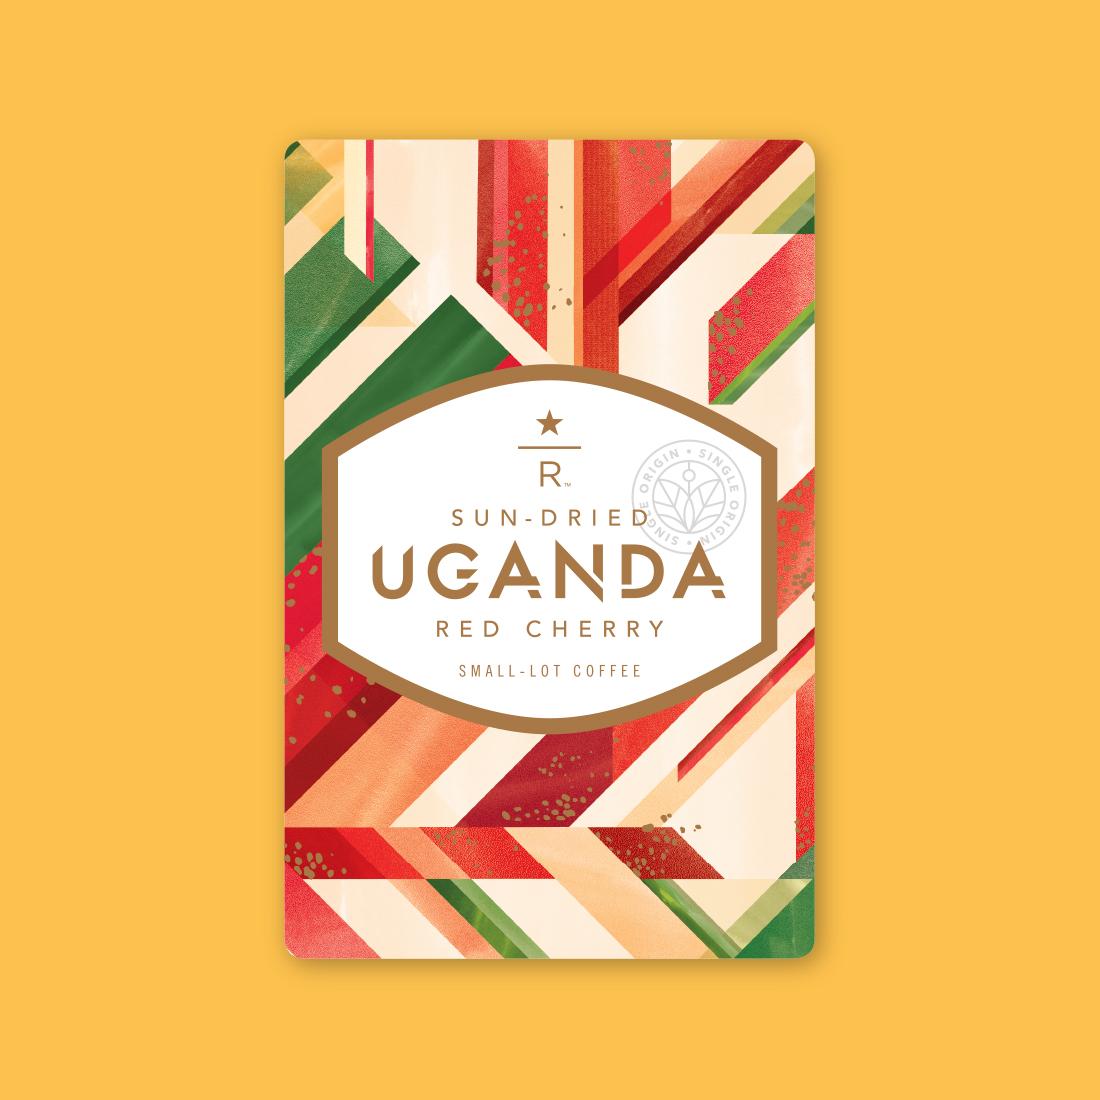 Coffee card illustration for SUN-DRIED UGANDA RED CHERRY